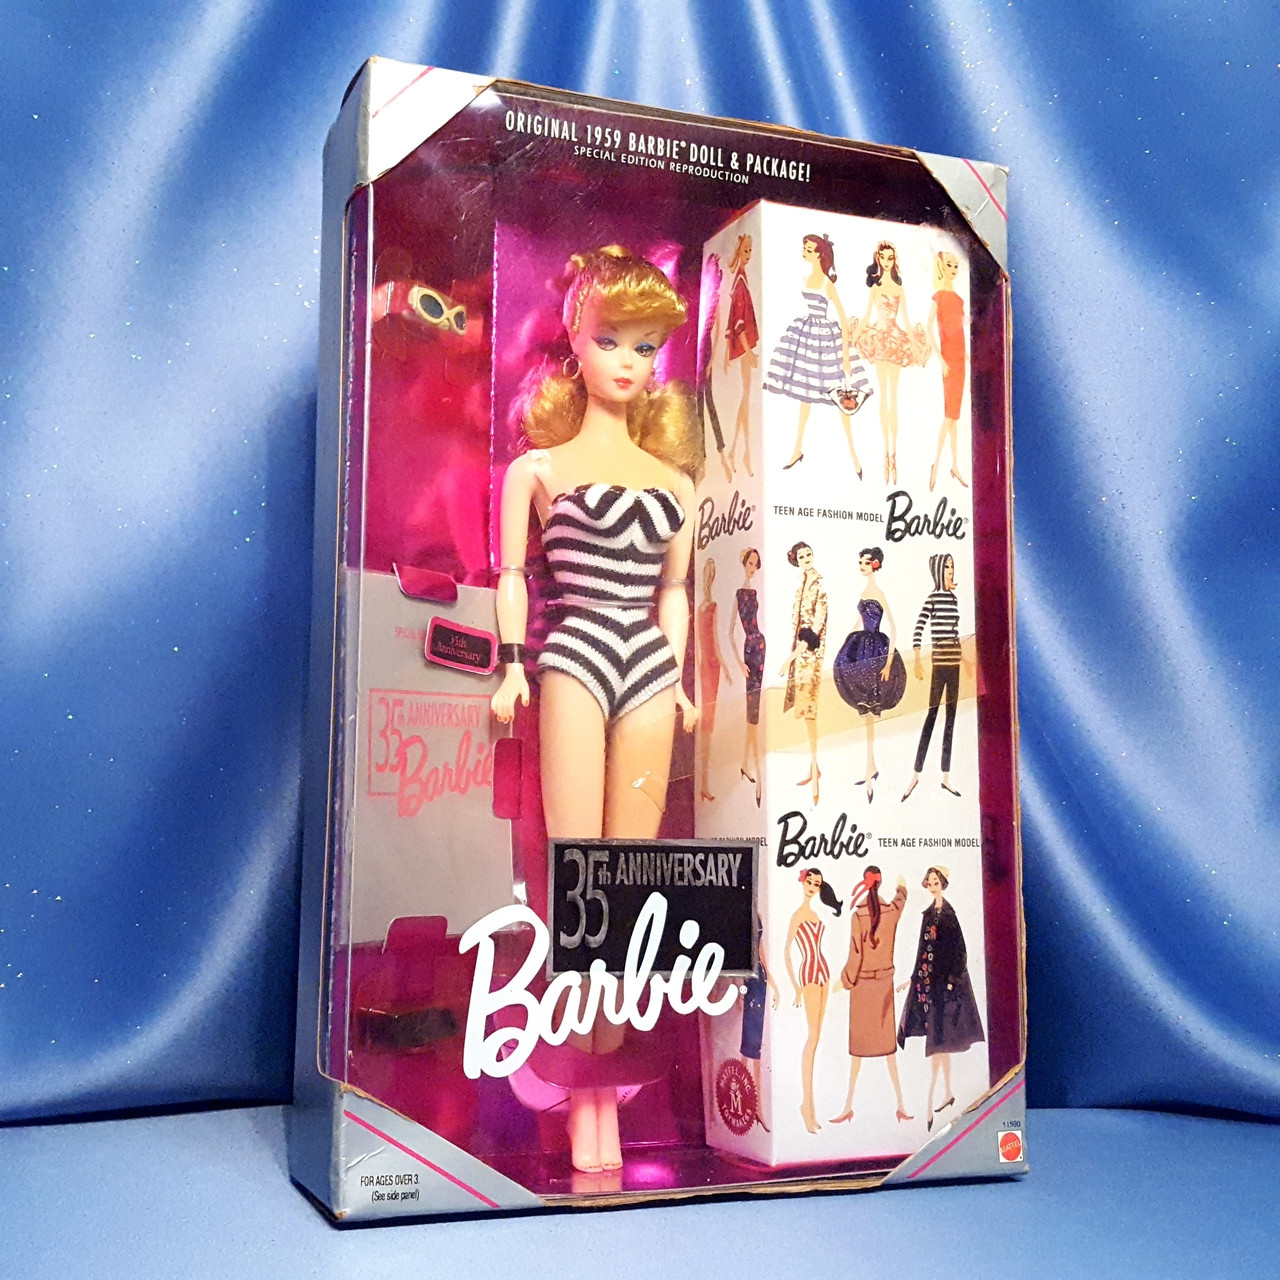 Sunglasses Shoes Booklet Barbie Reproduction 35th Anniversary Zebra Swimsuit